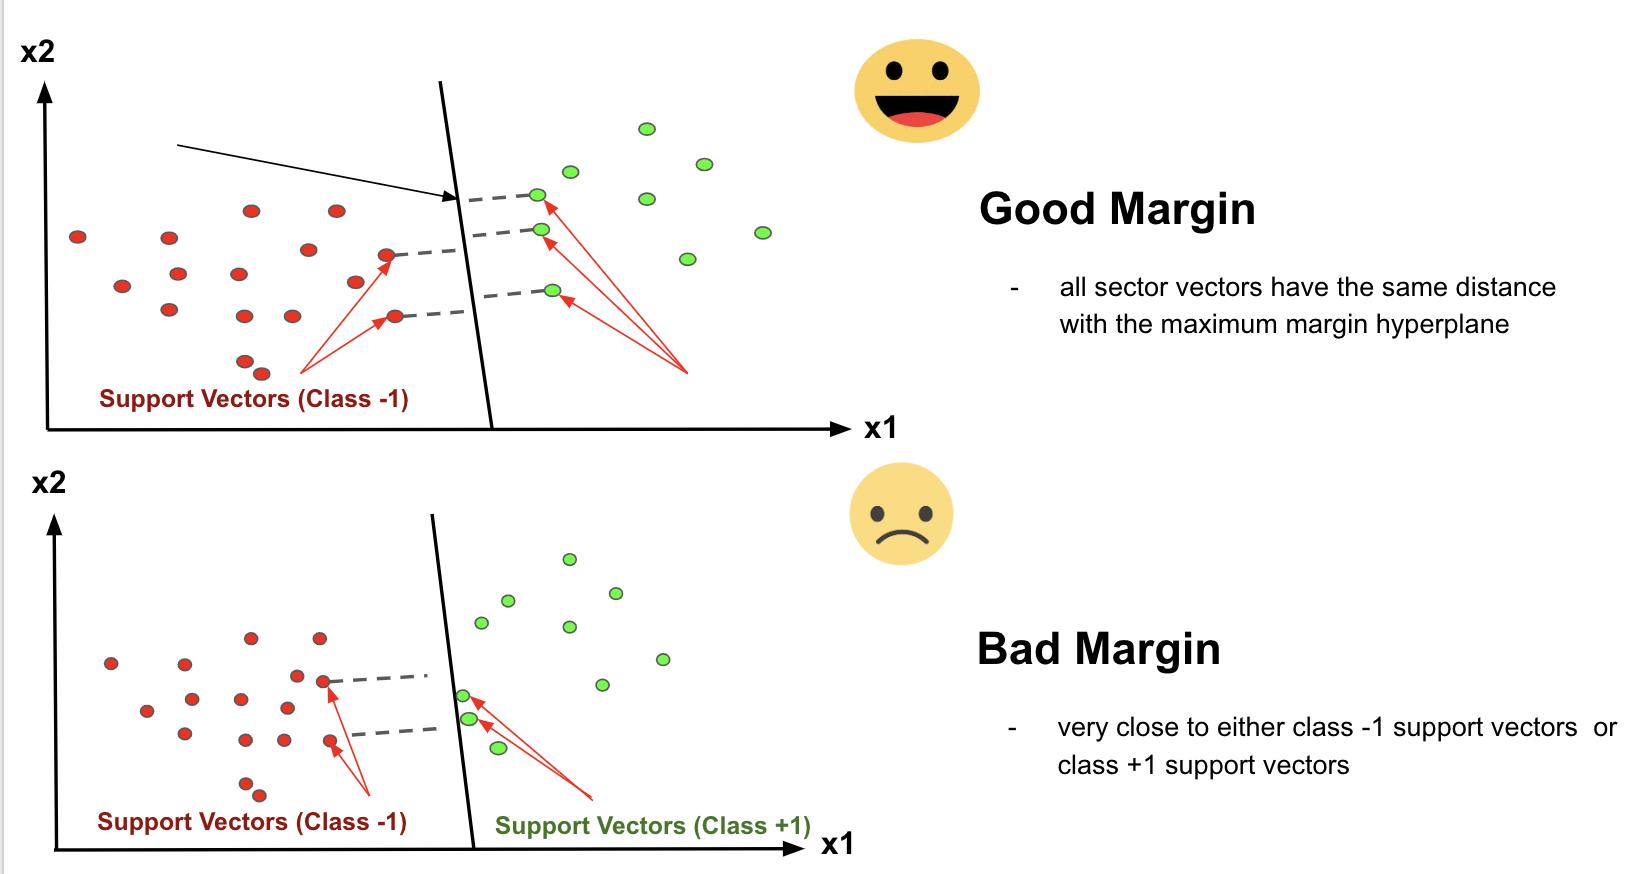 good margin and bad margin